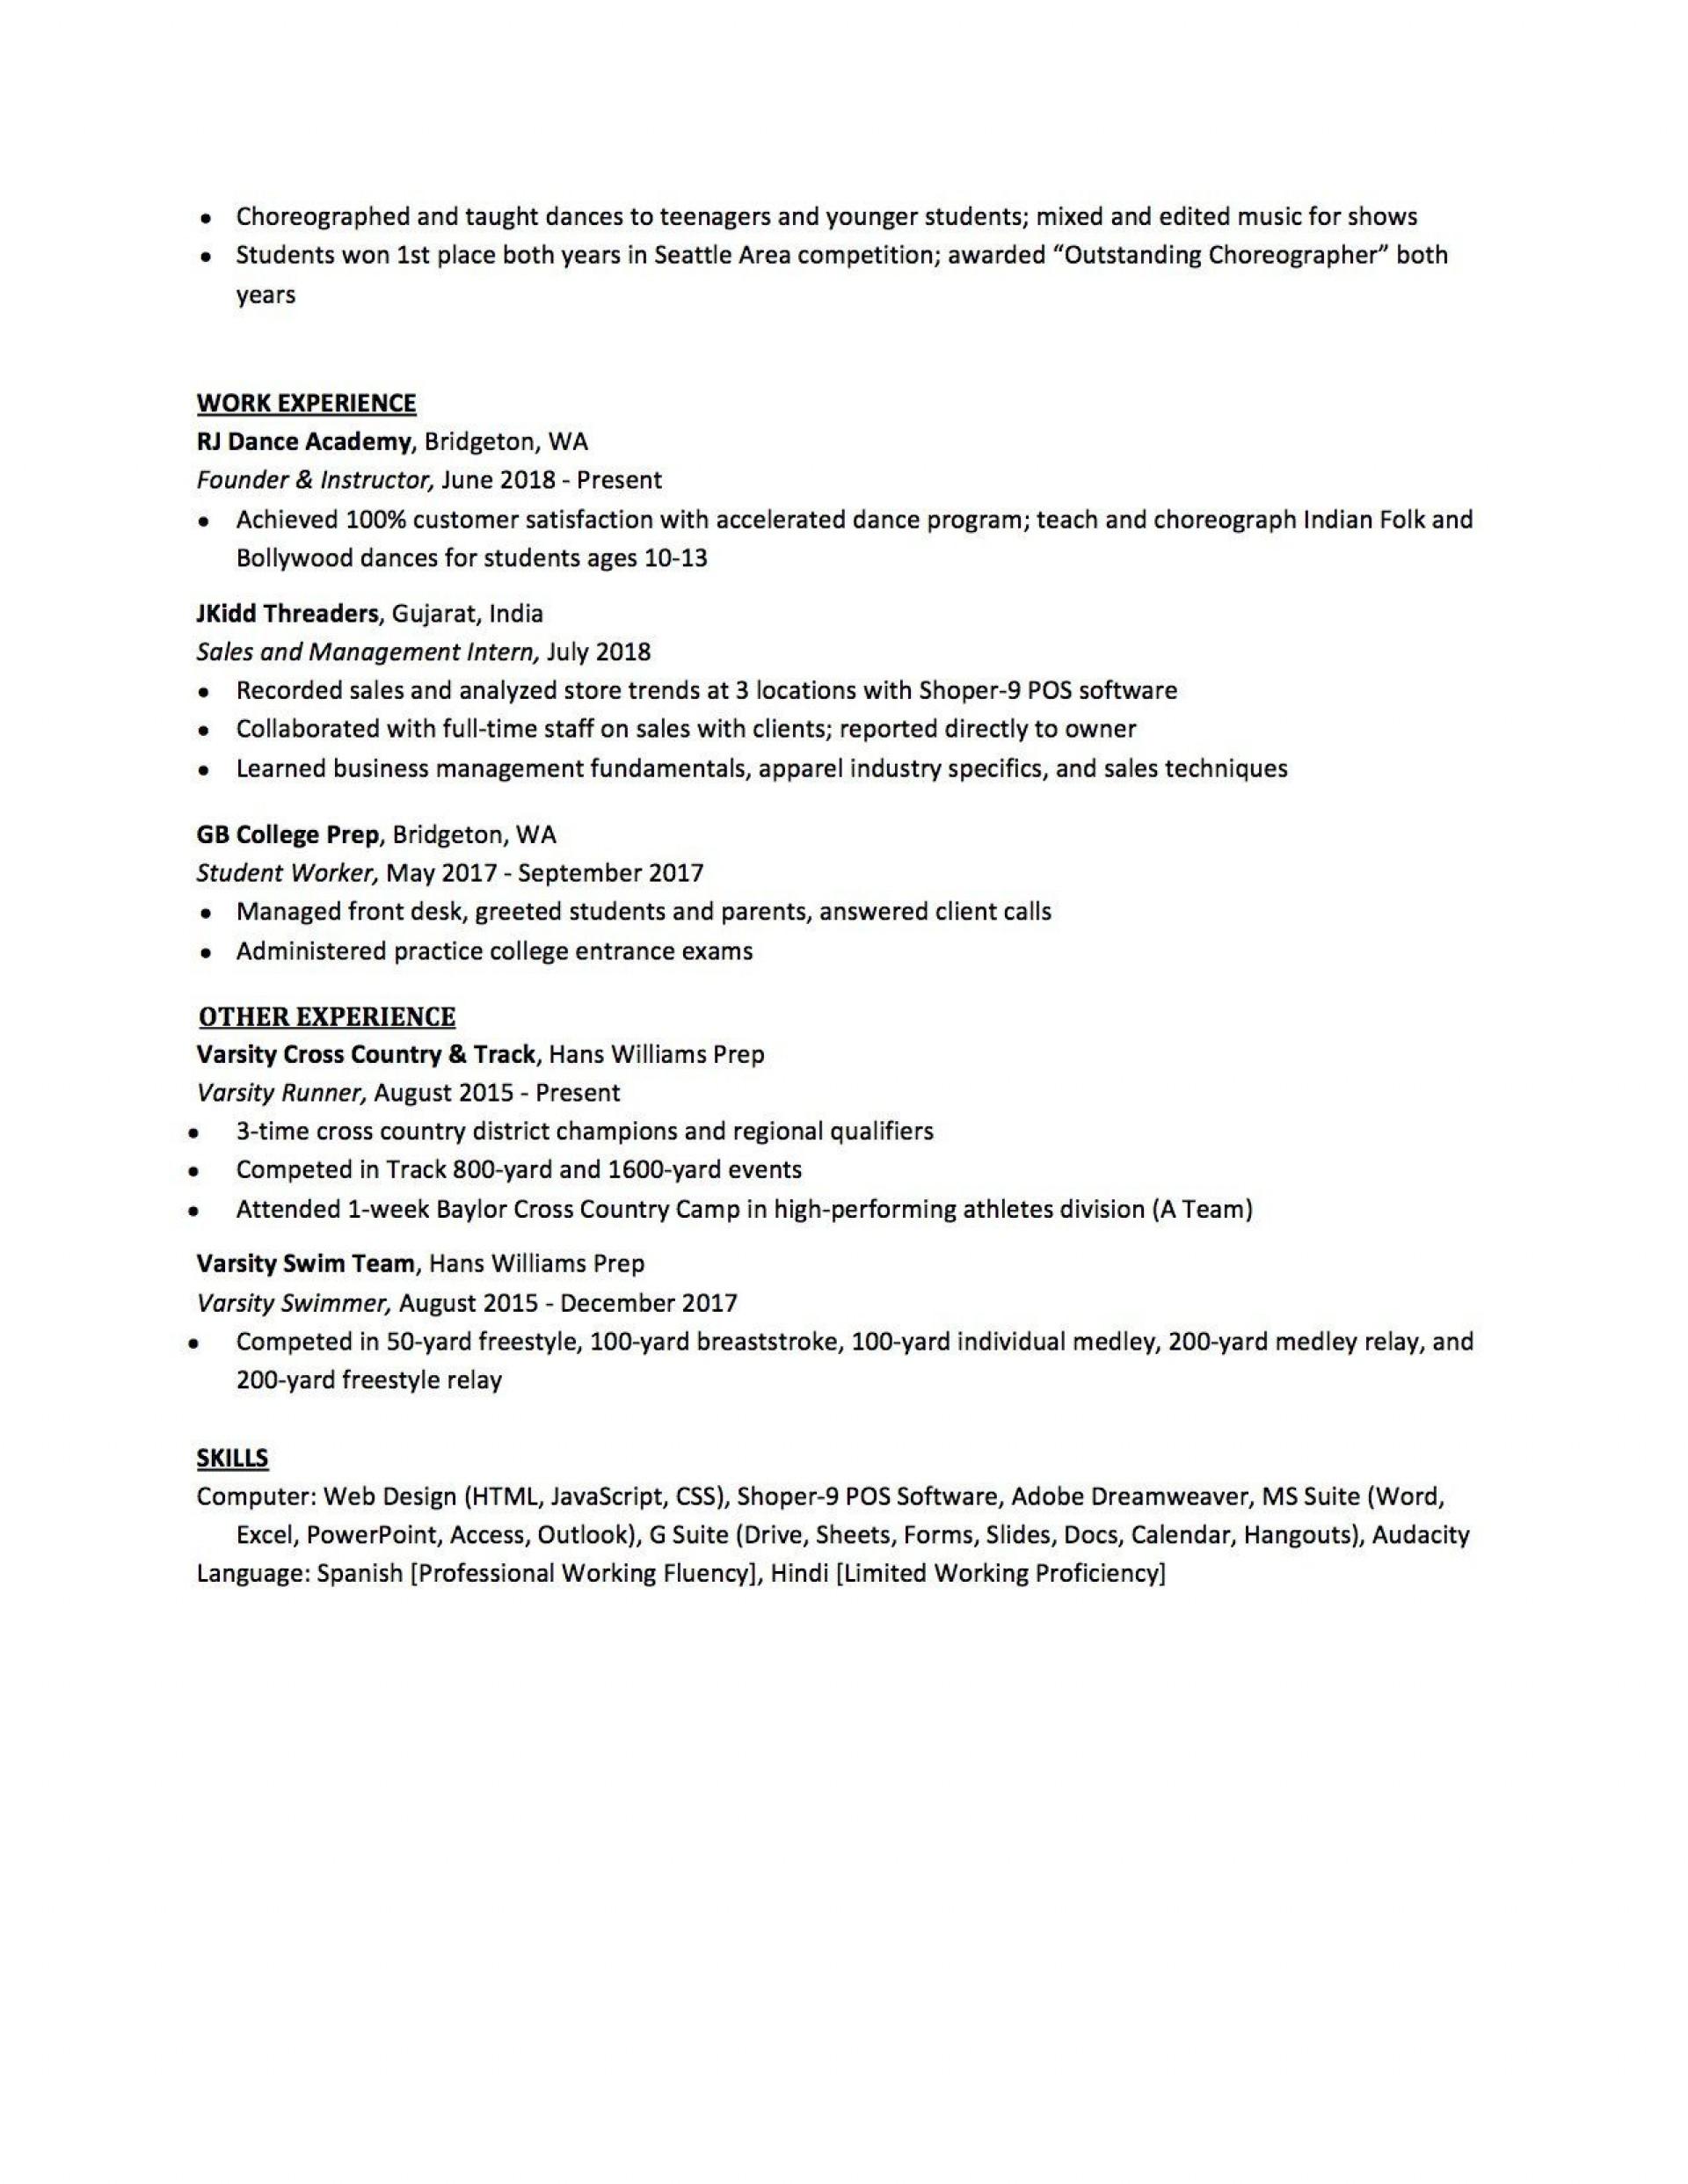 008 Simple Resume Template High School Photo  Student Australia For Google Doc Graduate Microsoft Word1920